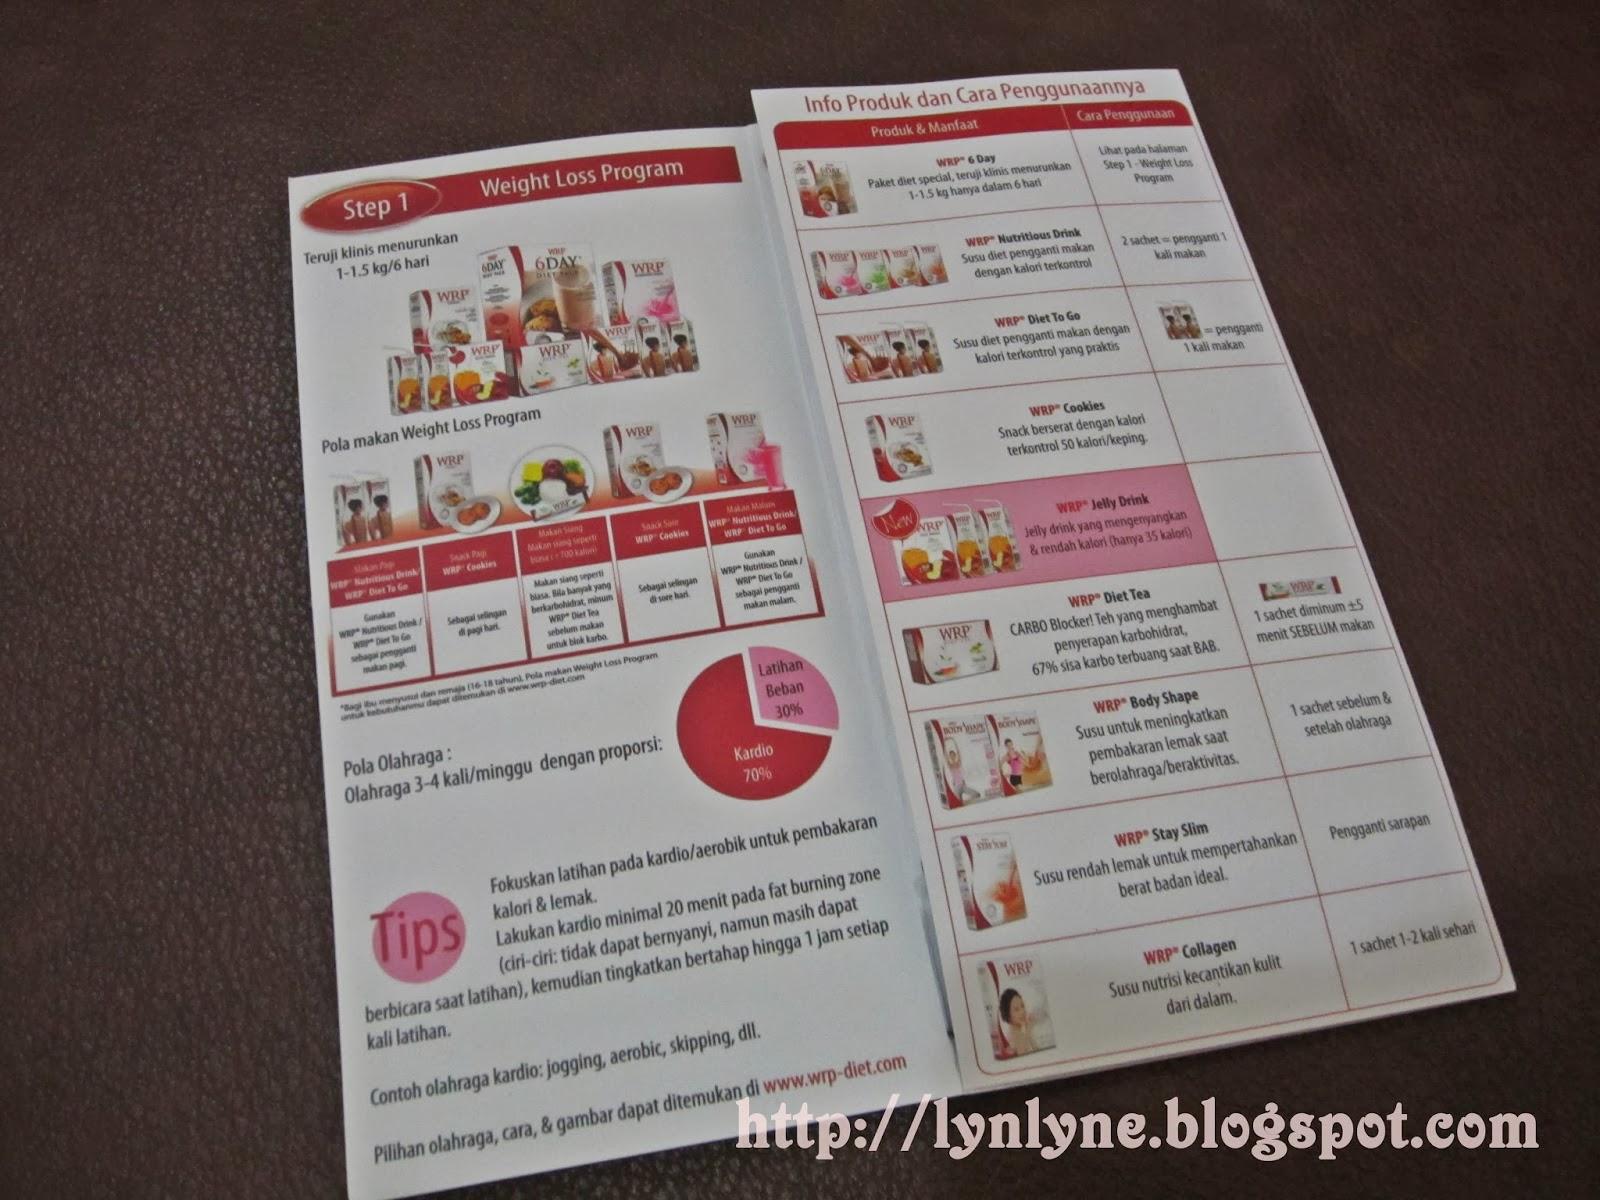 Best natural fat loss supplement photo 4